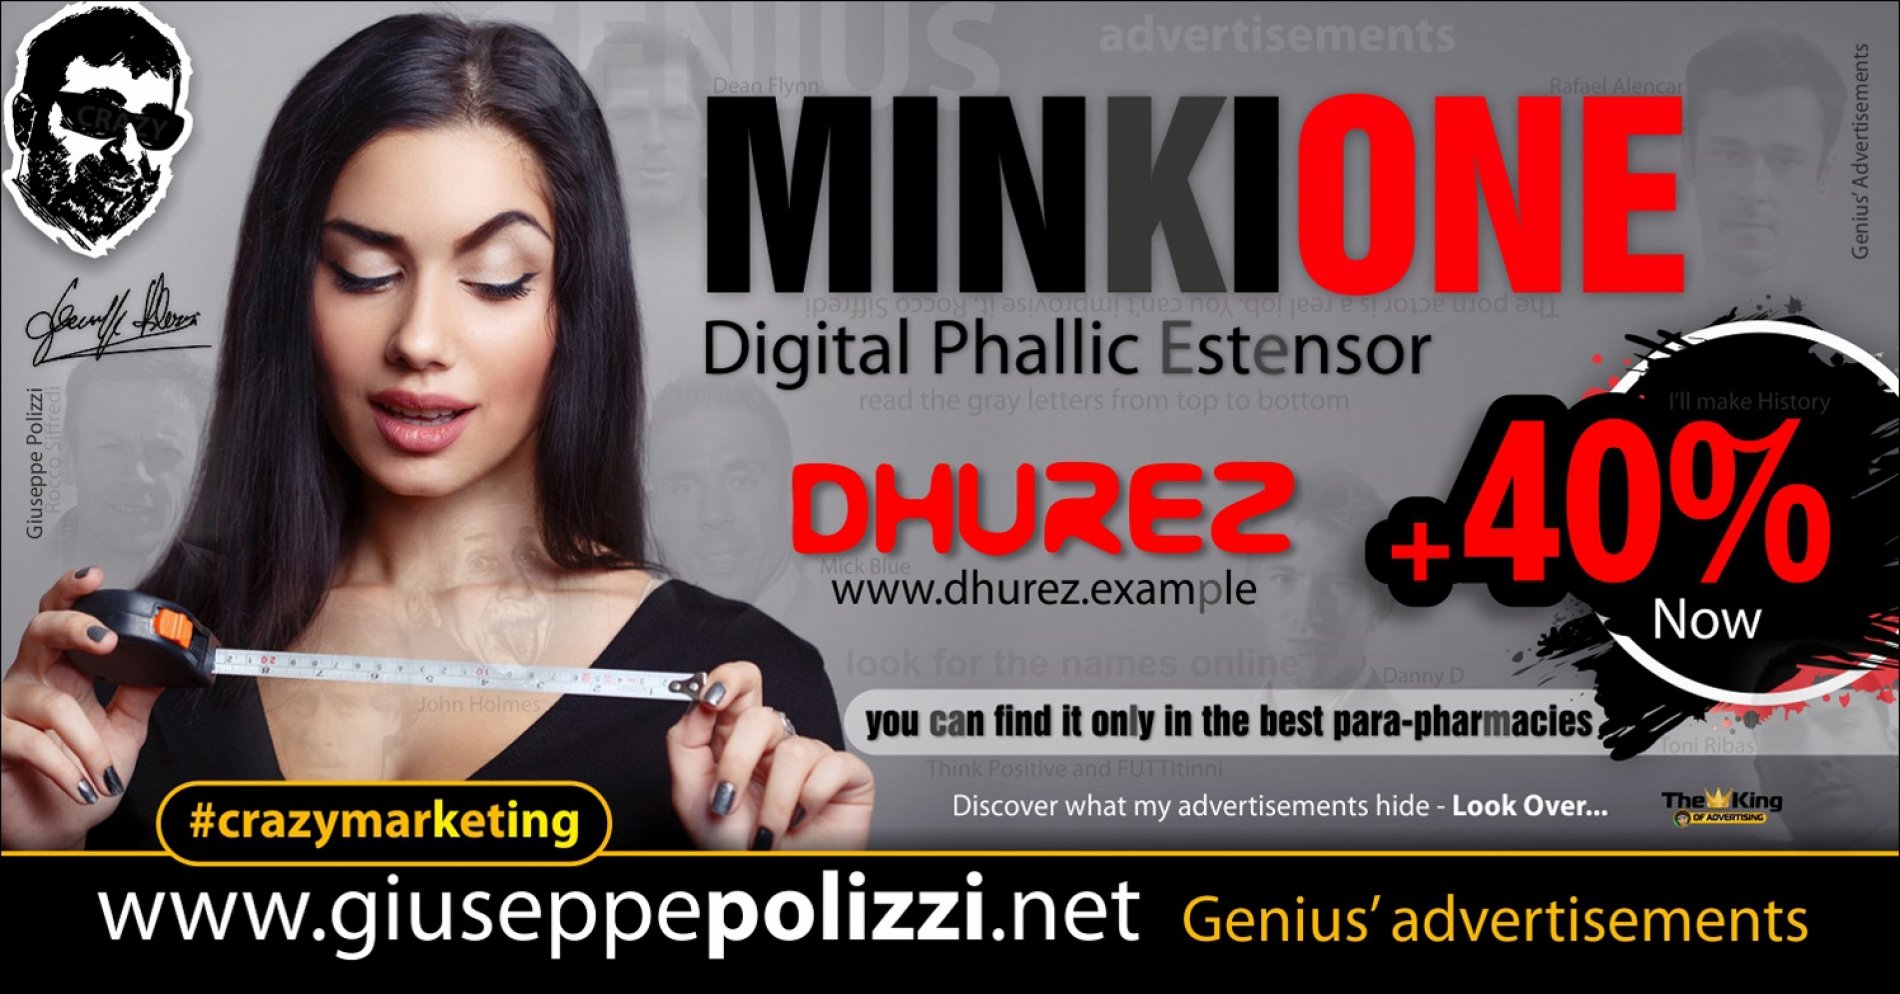 giuseppe polizzi crazymarketing MinkiOne genius  2018 advertising